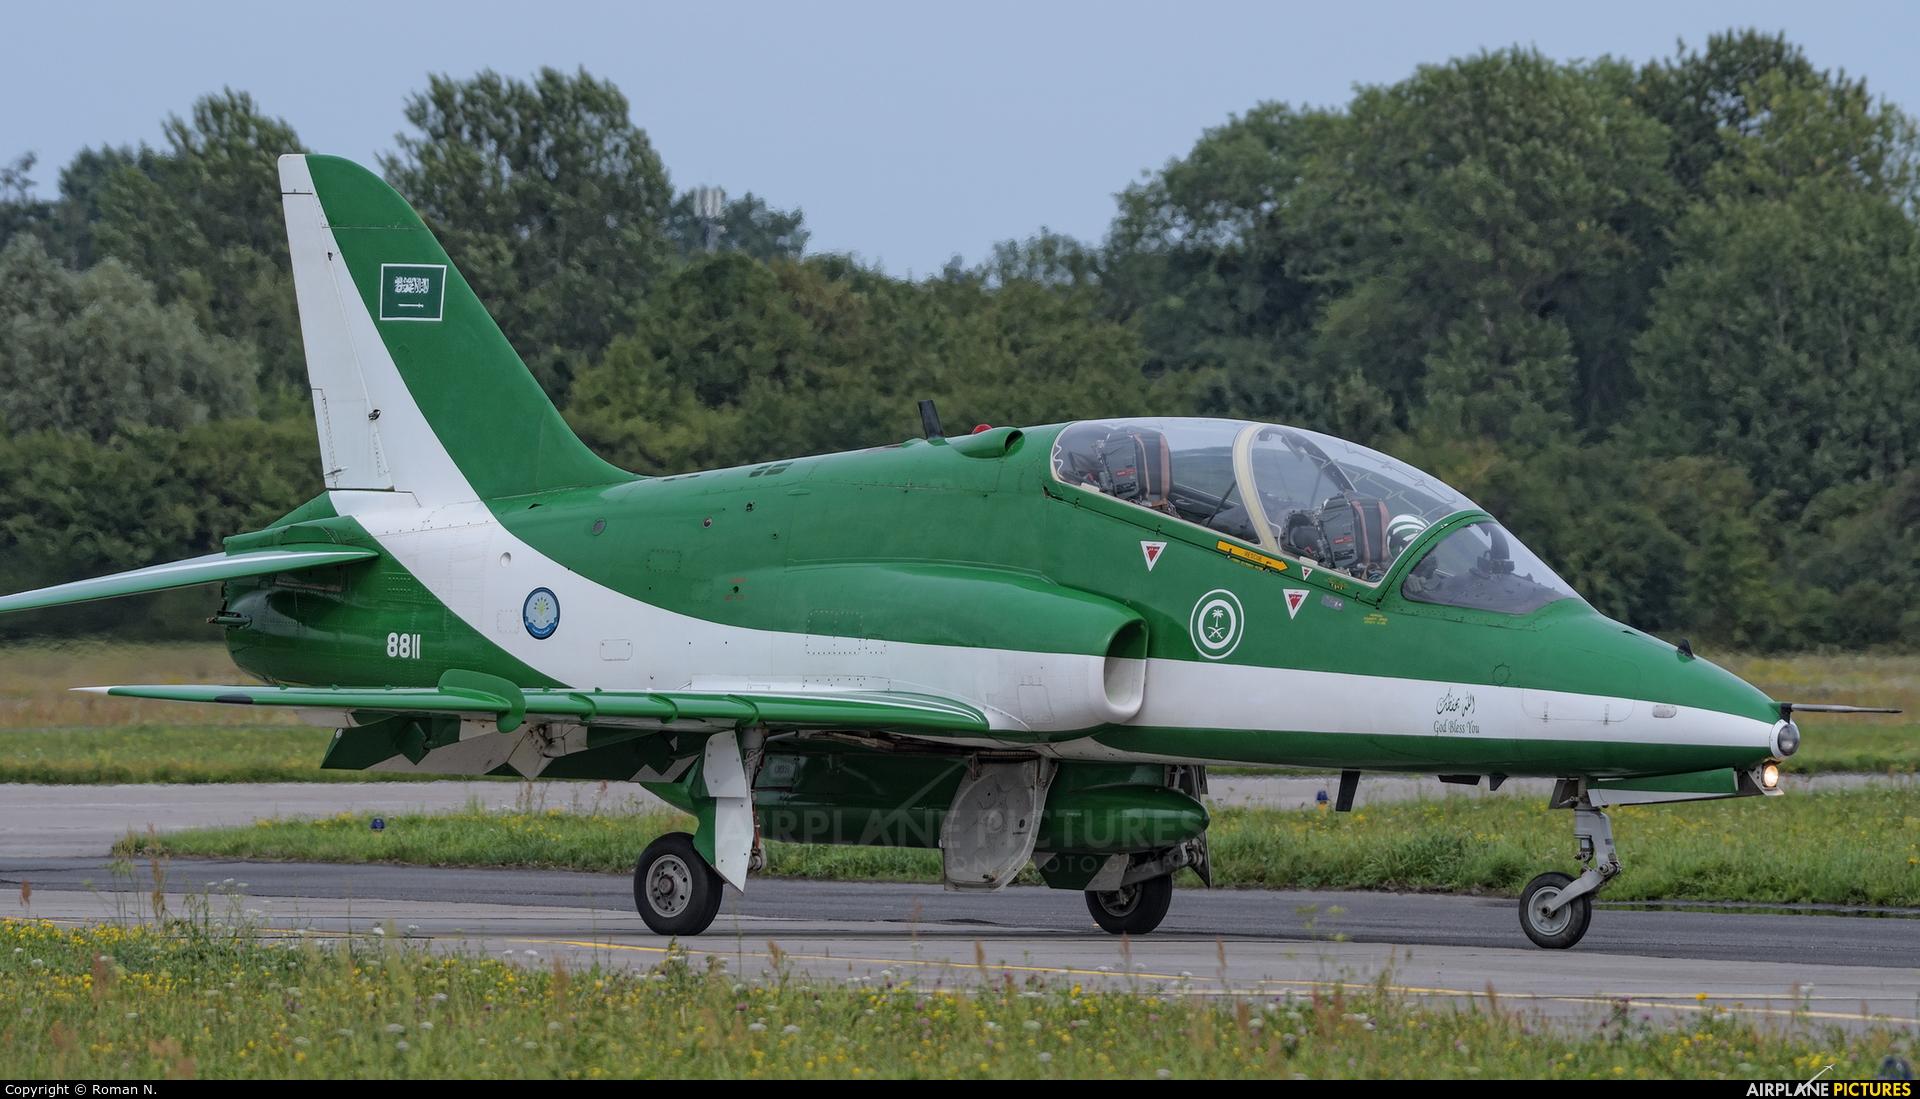 Saudi Arabia - Air Force: Saudi Hawks 8811 aircraft at Gdynia- Babie Doły (Oksywie)